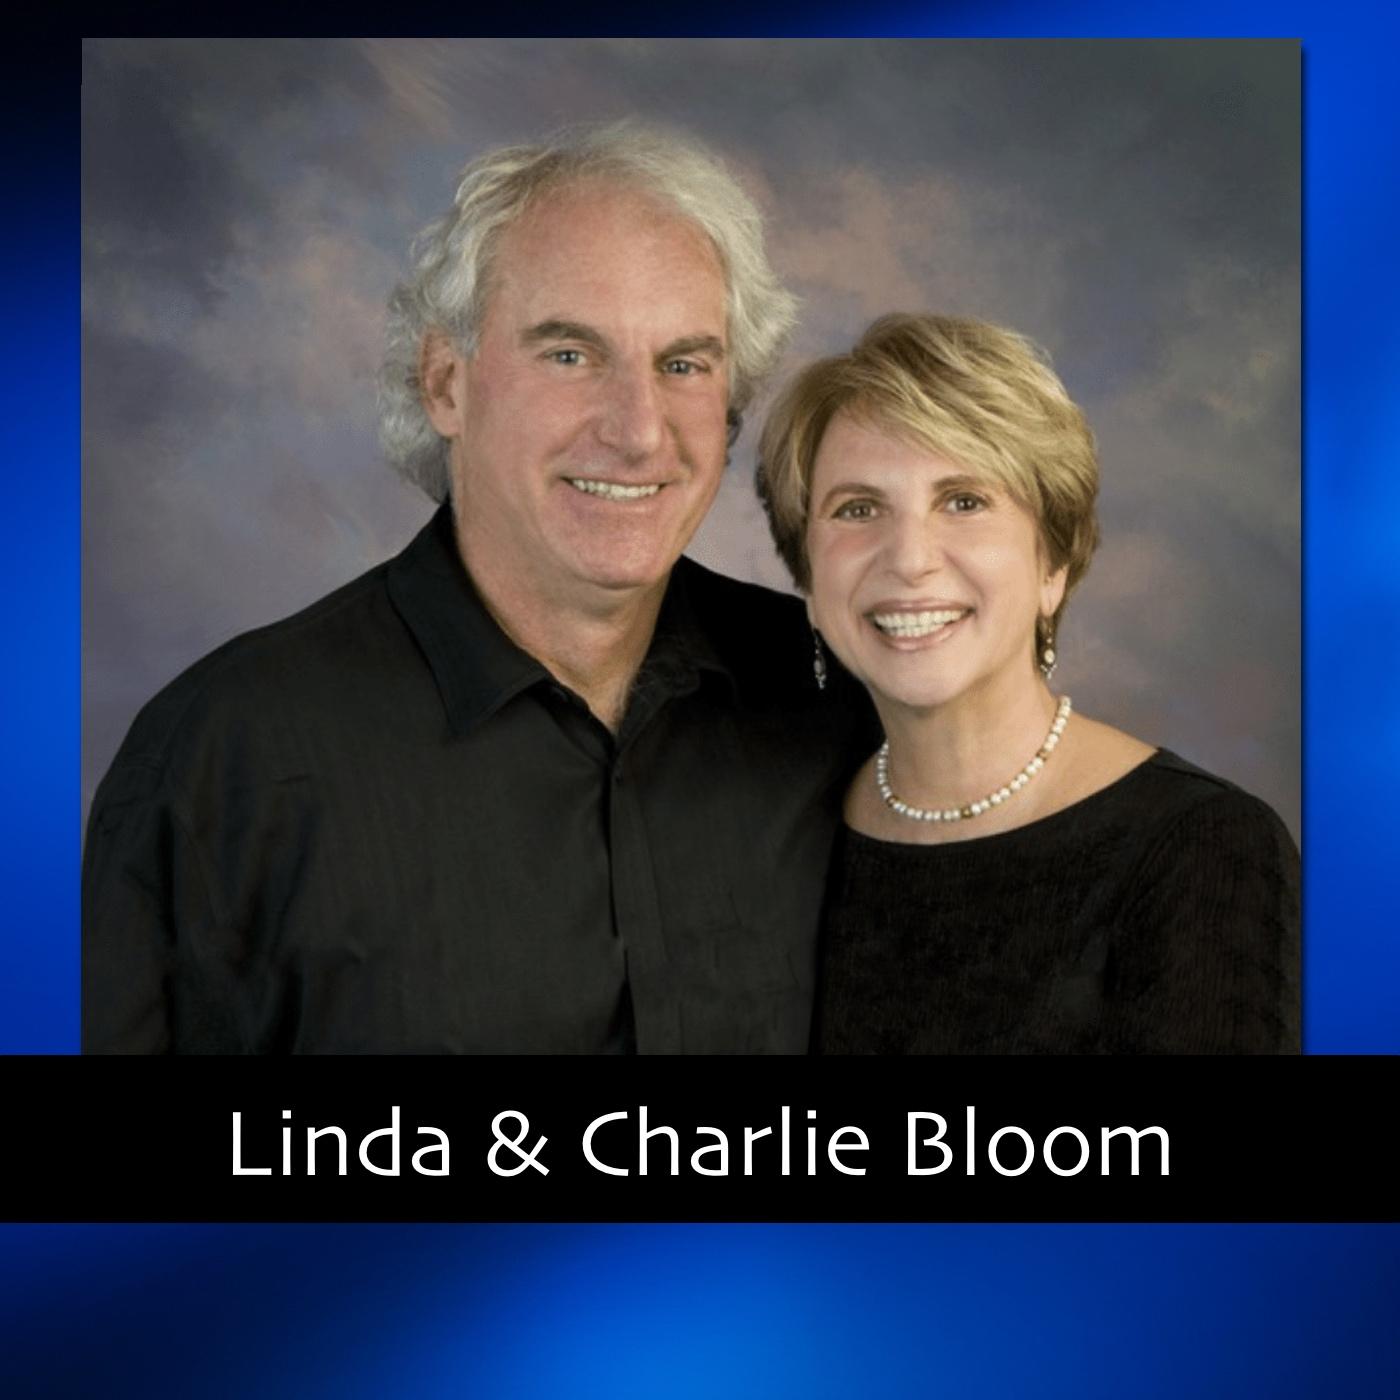 Linda & Chalie Bloom Thumb.jpg